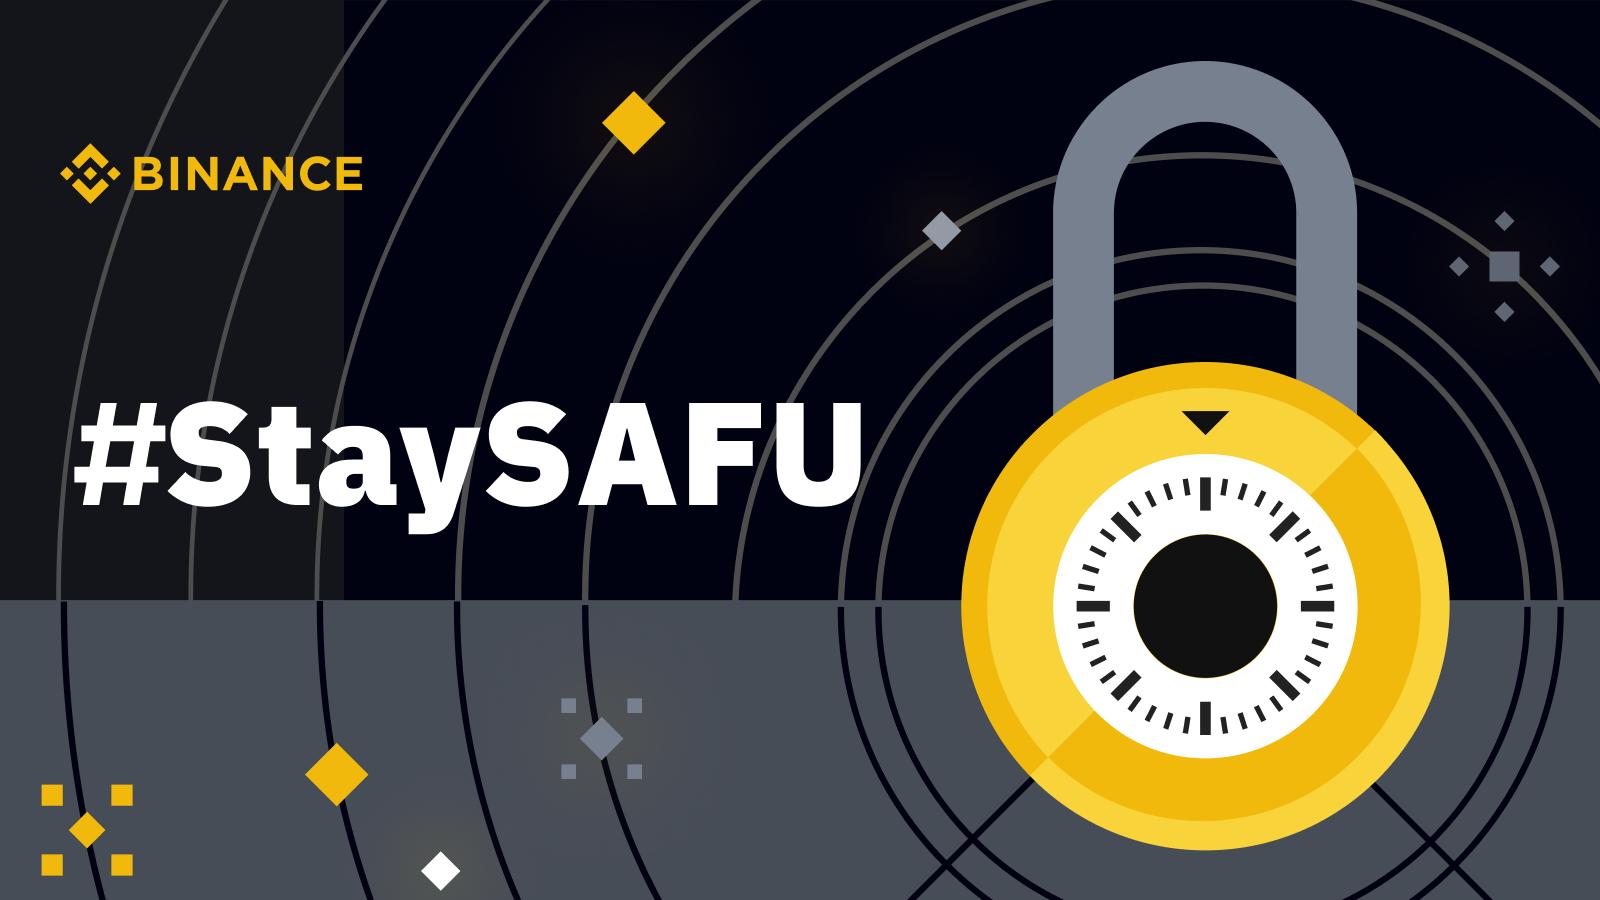 StaySAFU with Binance's Security Campaign | Binance Blog